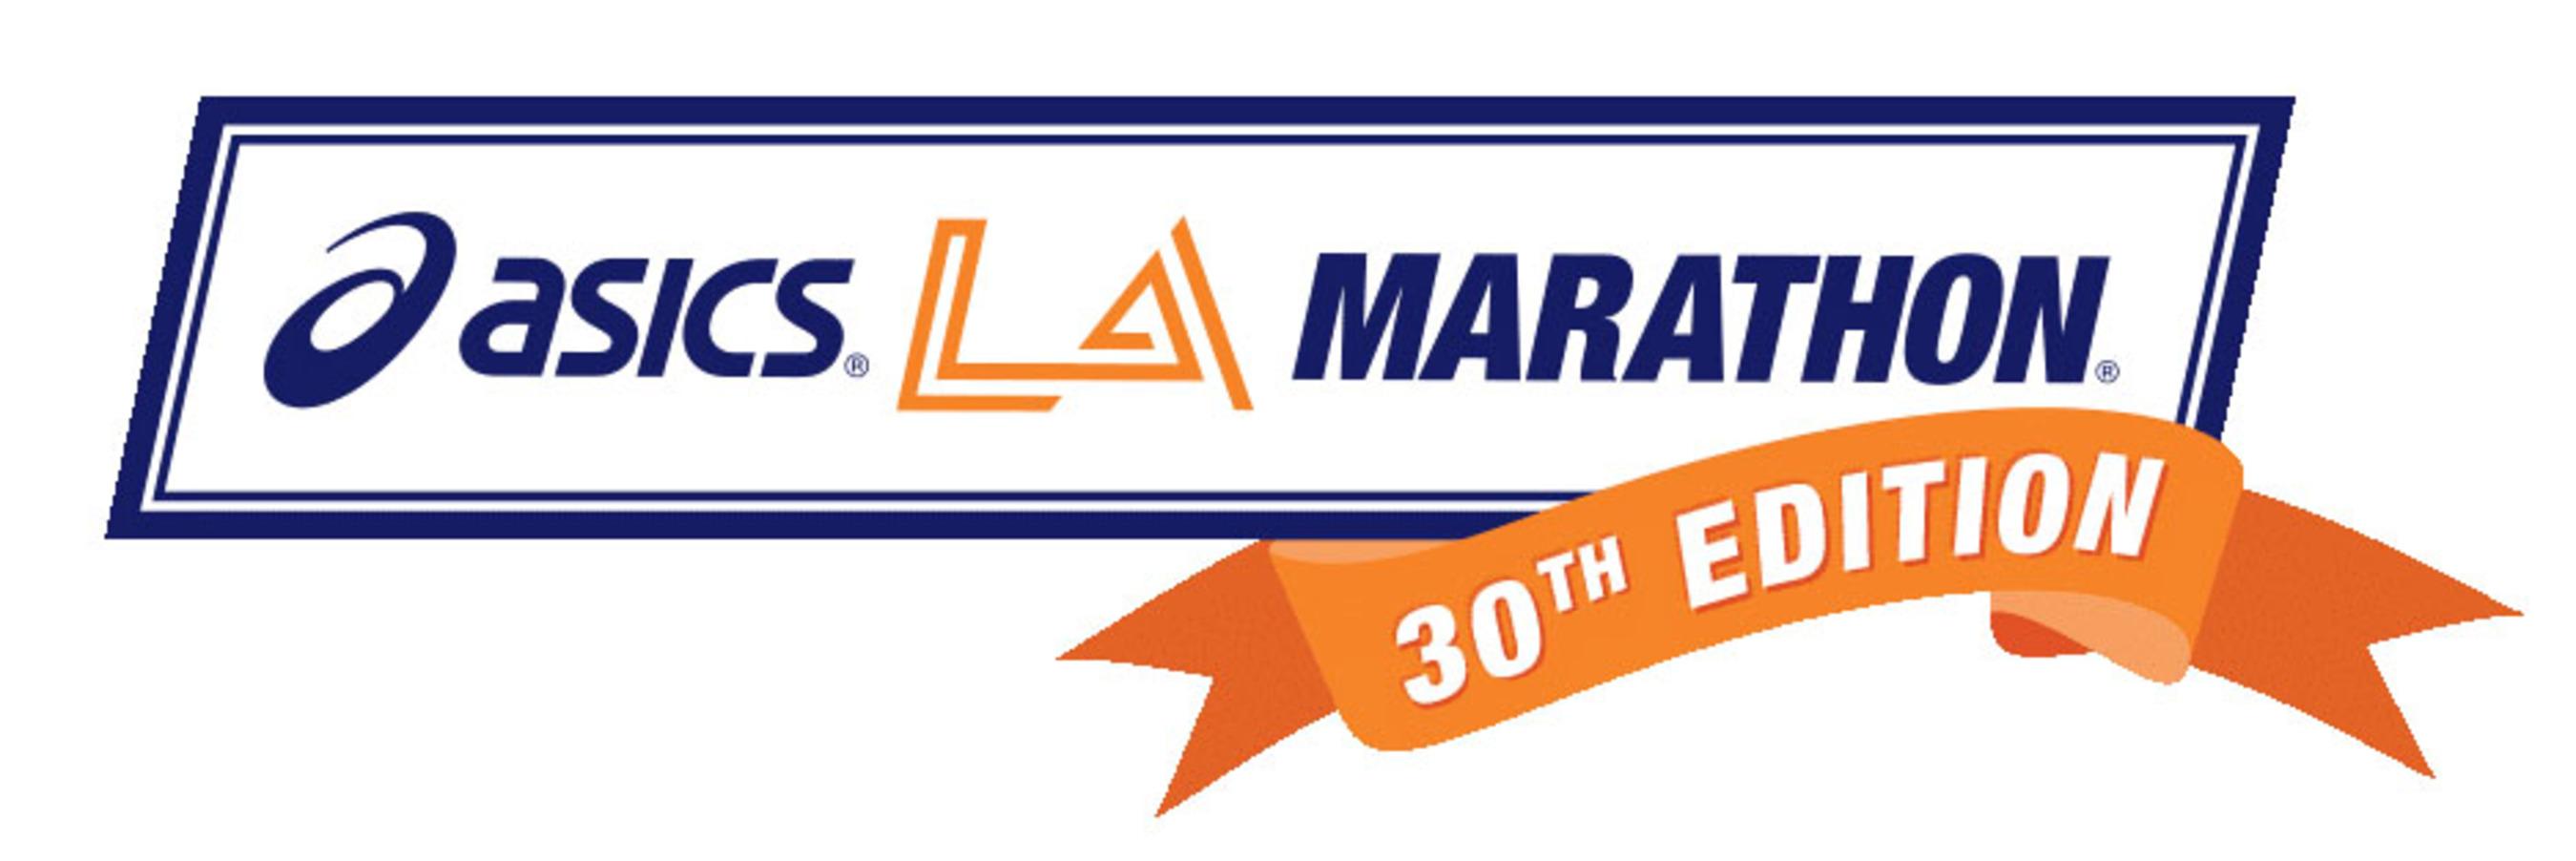 ASICS LA Marathon 30th Edition